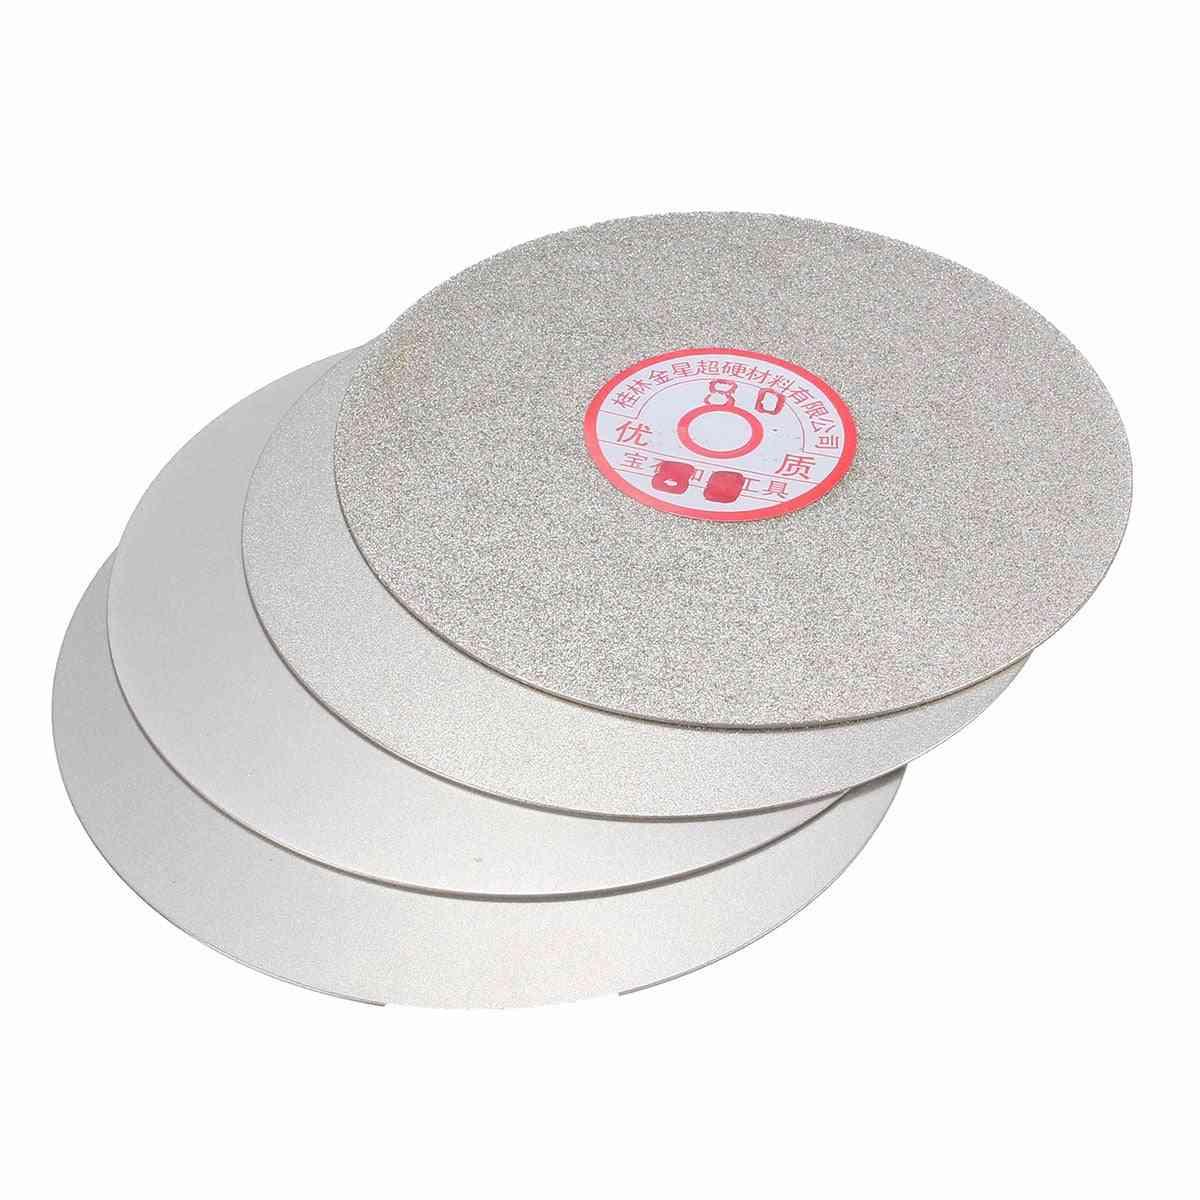 Diamond Polishing Disc, Flat Lap Grinding Wheel Lapping Grinding-disc Tool